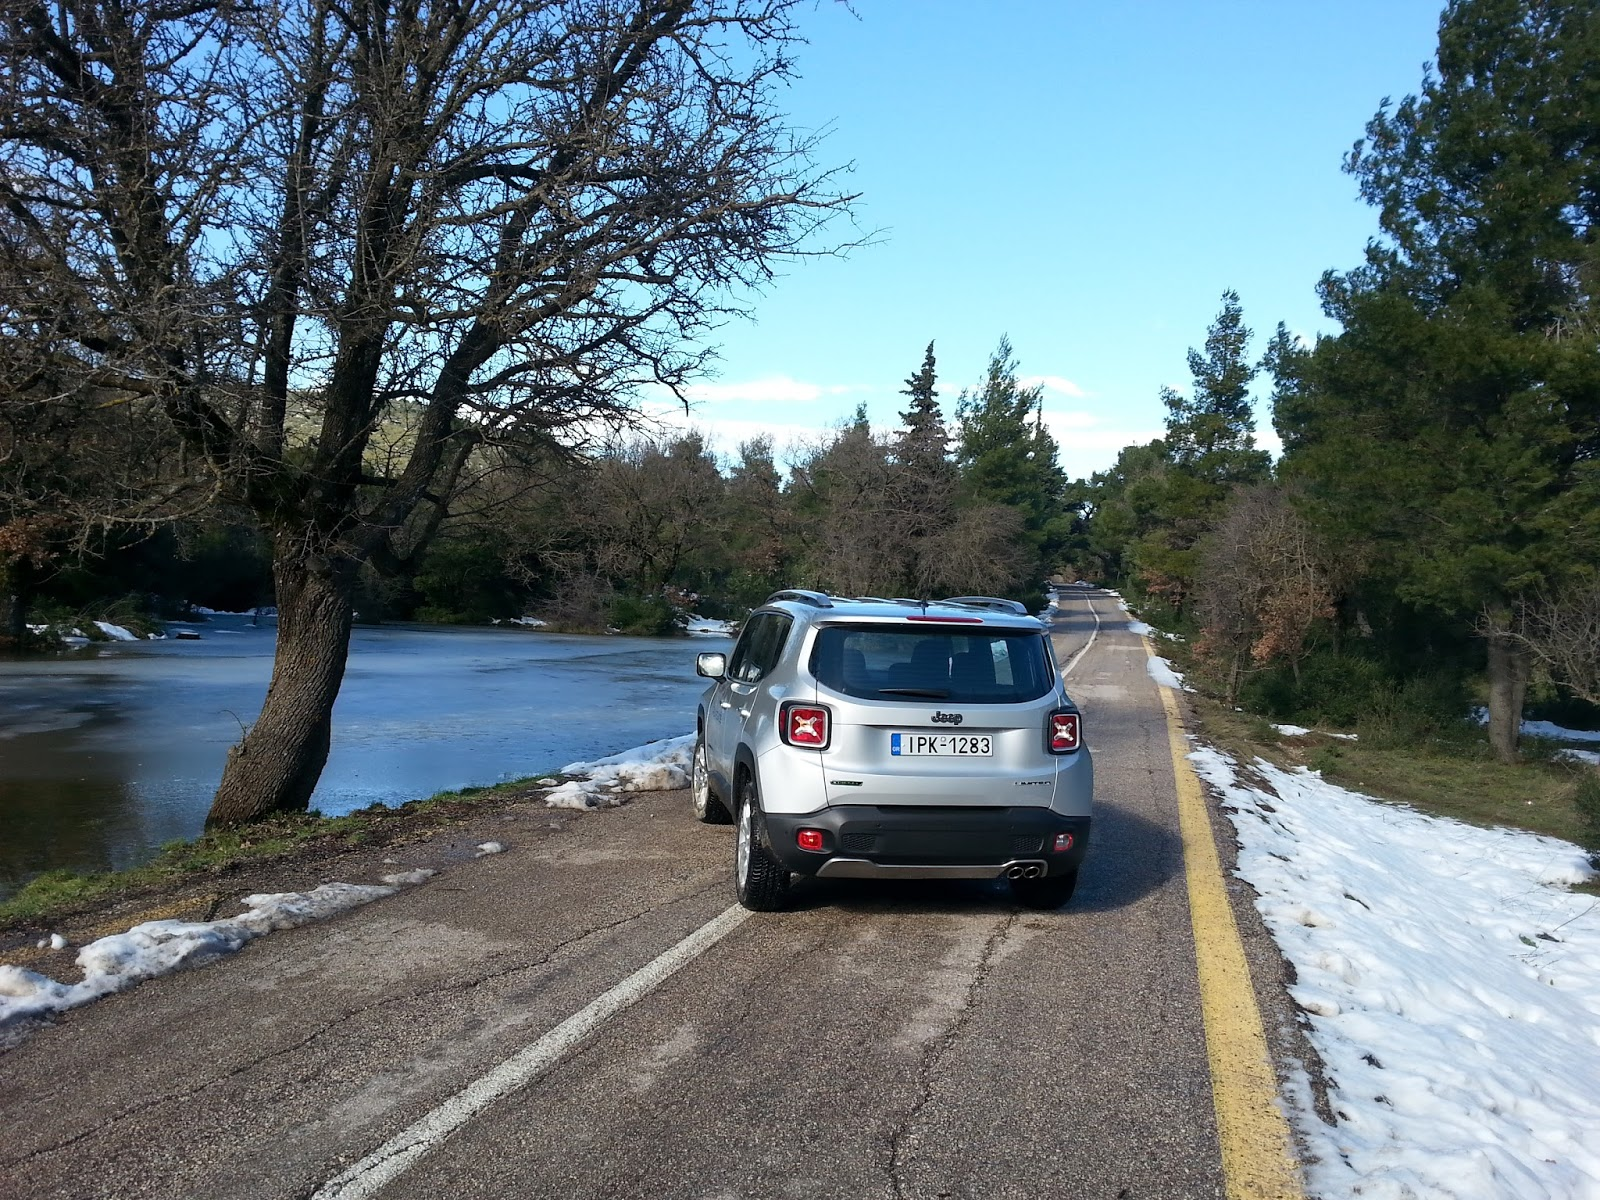 f6 Ρίχνουμε ένα Jeep Renegade σε λάσπη, χιόνι, χώμα